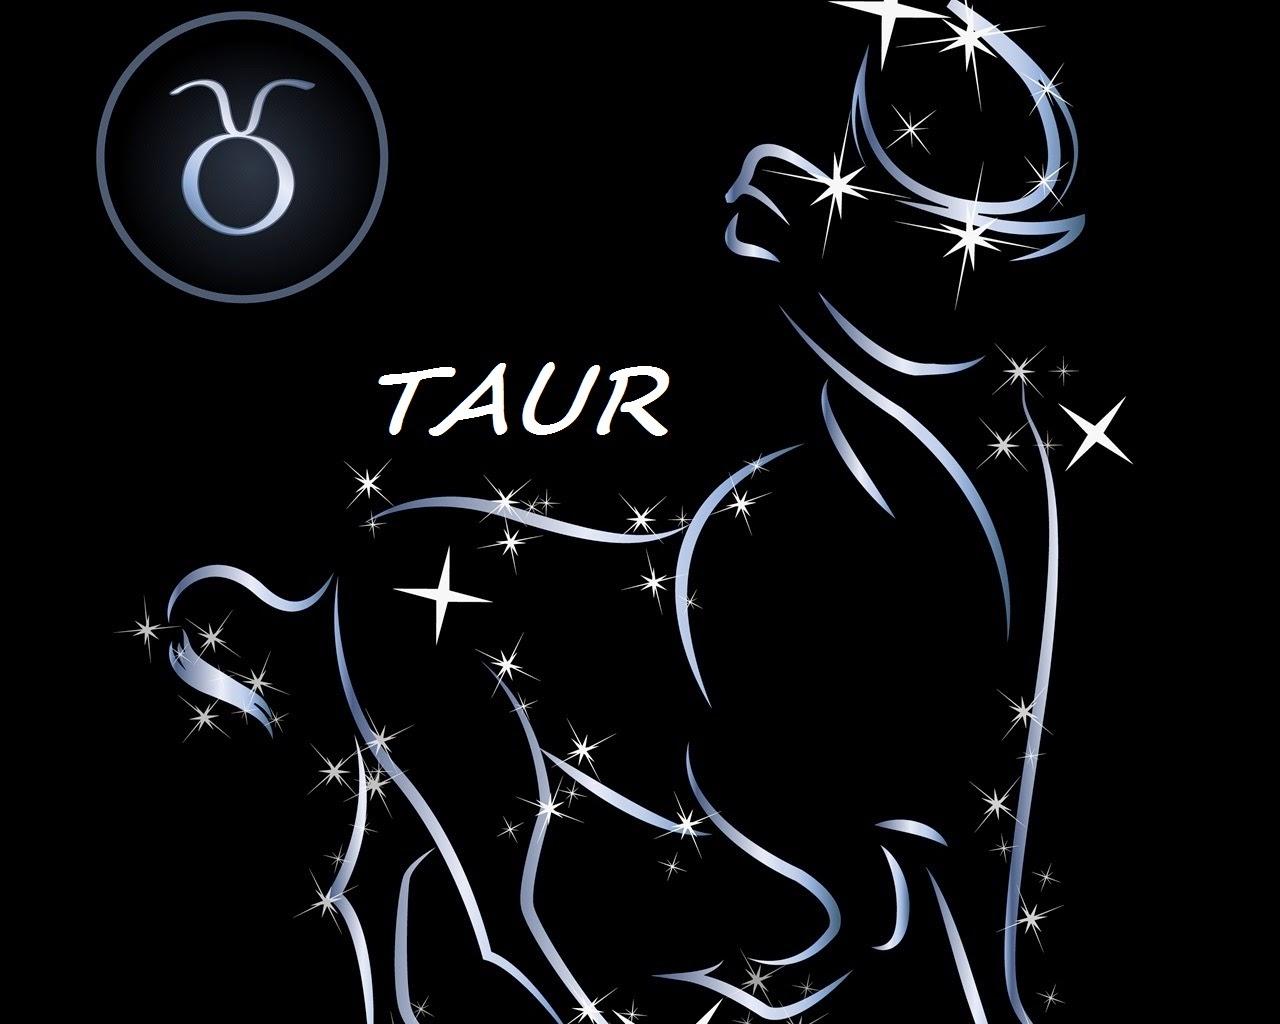 Horoscop octombrie 2014 - Taur